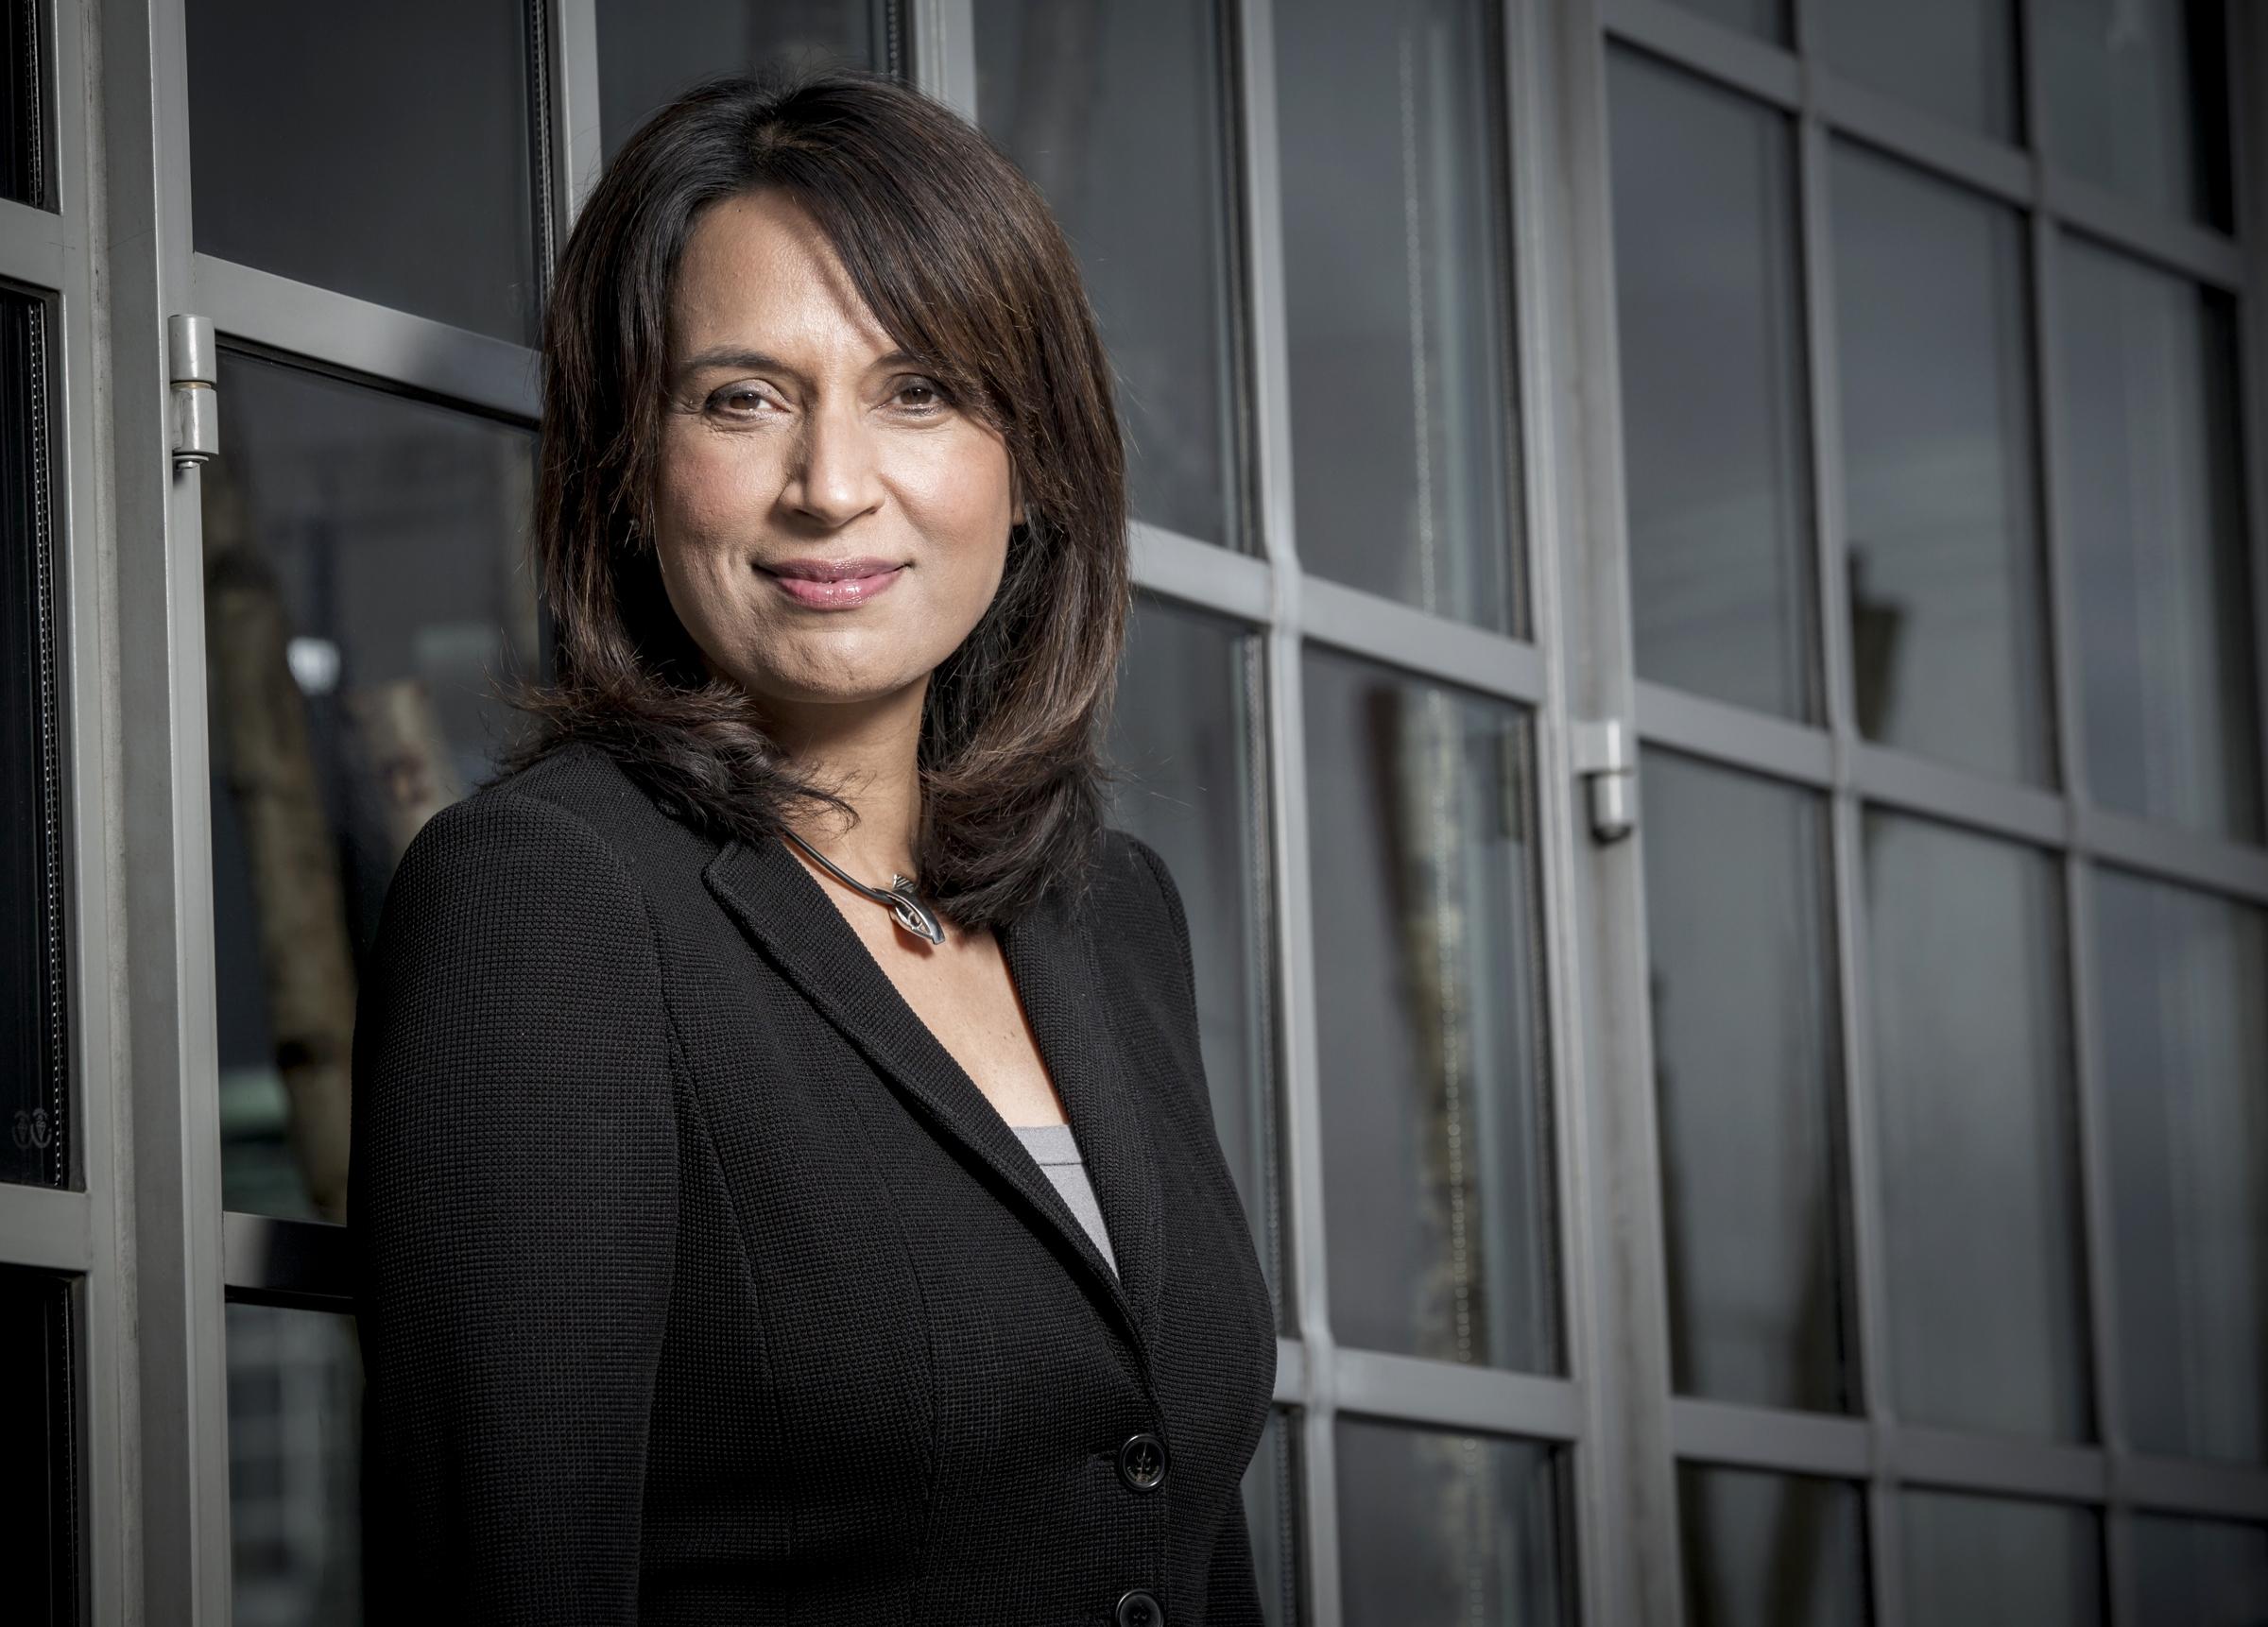 File:Ruby McGregor-Smith CEO of Mitie Group plc.jpg - Wikimedia ...